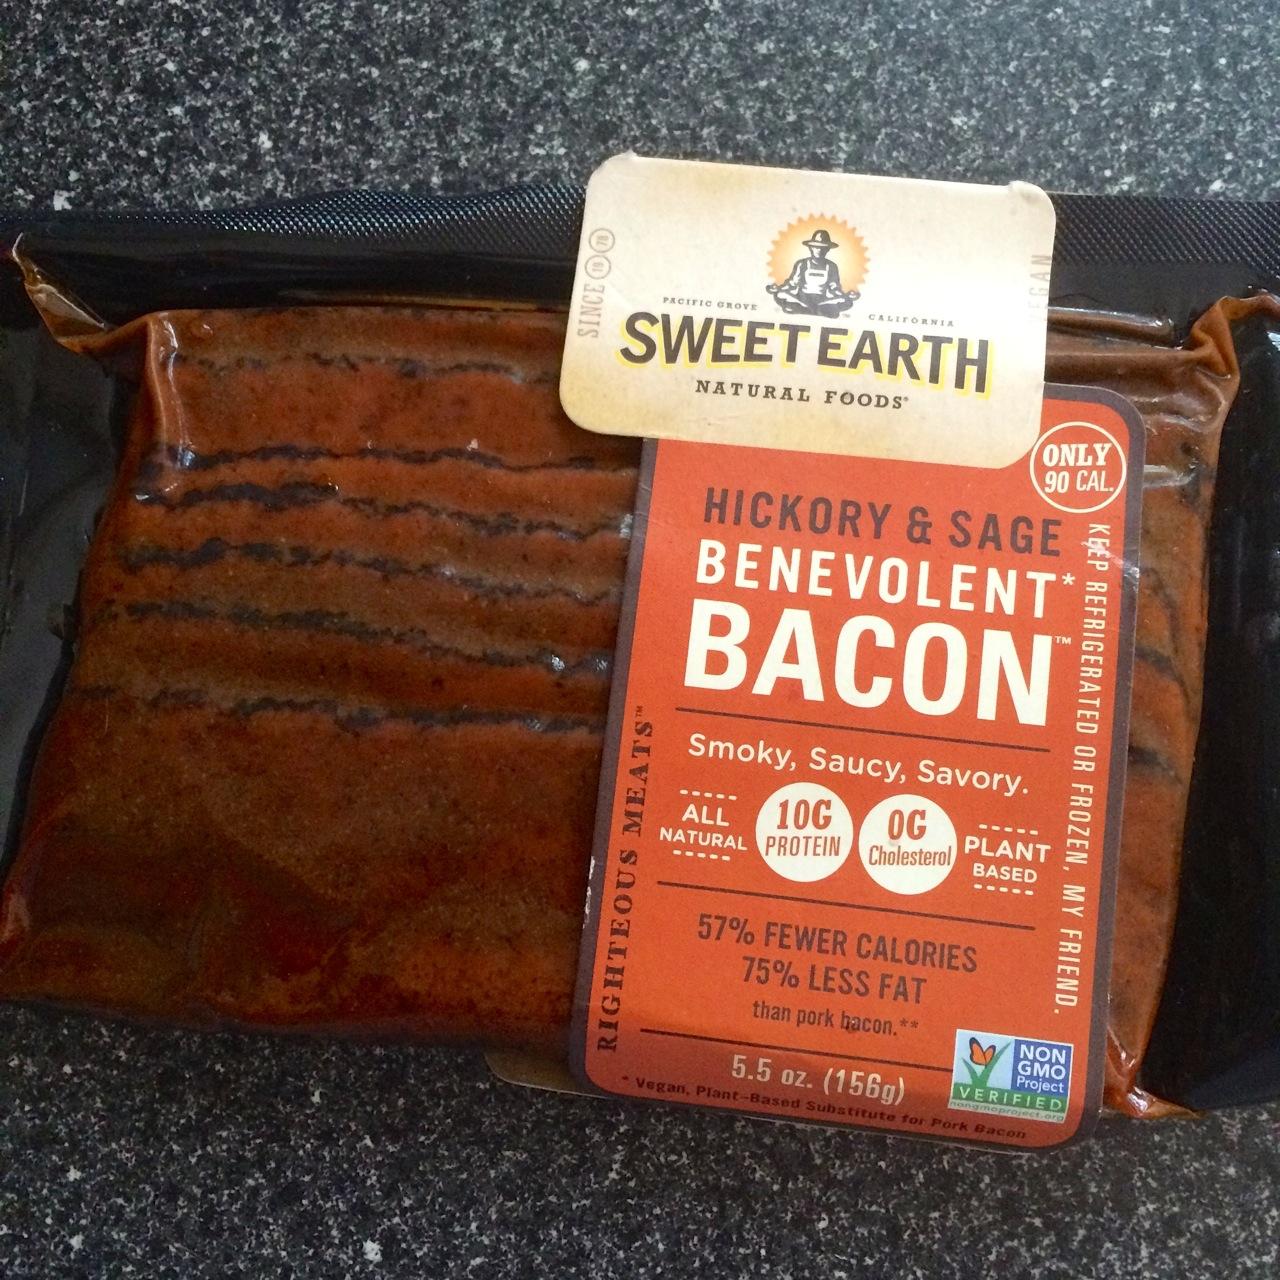 http://i2.wp.com/fatgayvegan.com/wp-content/uploads/2015/06/sweet-earth-seitan-bacon.jpg?fit=1280%2C1280